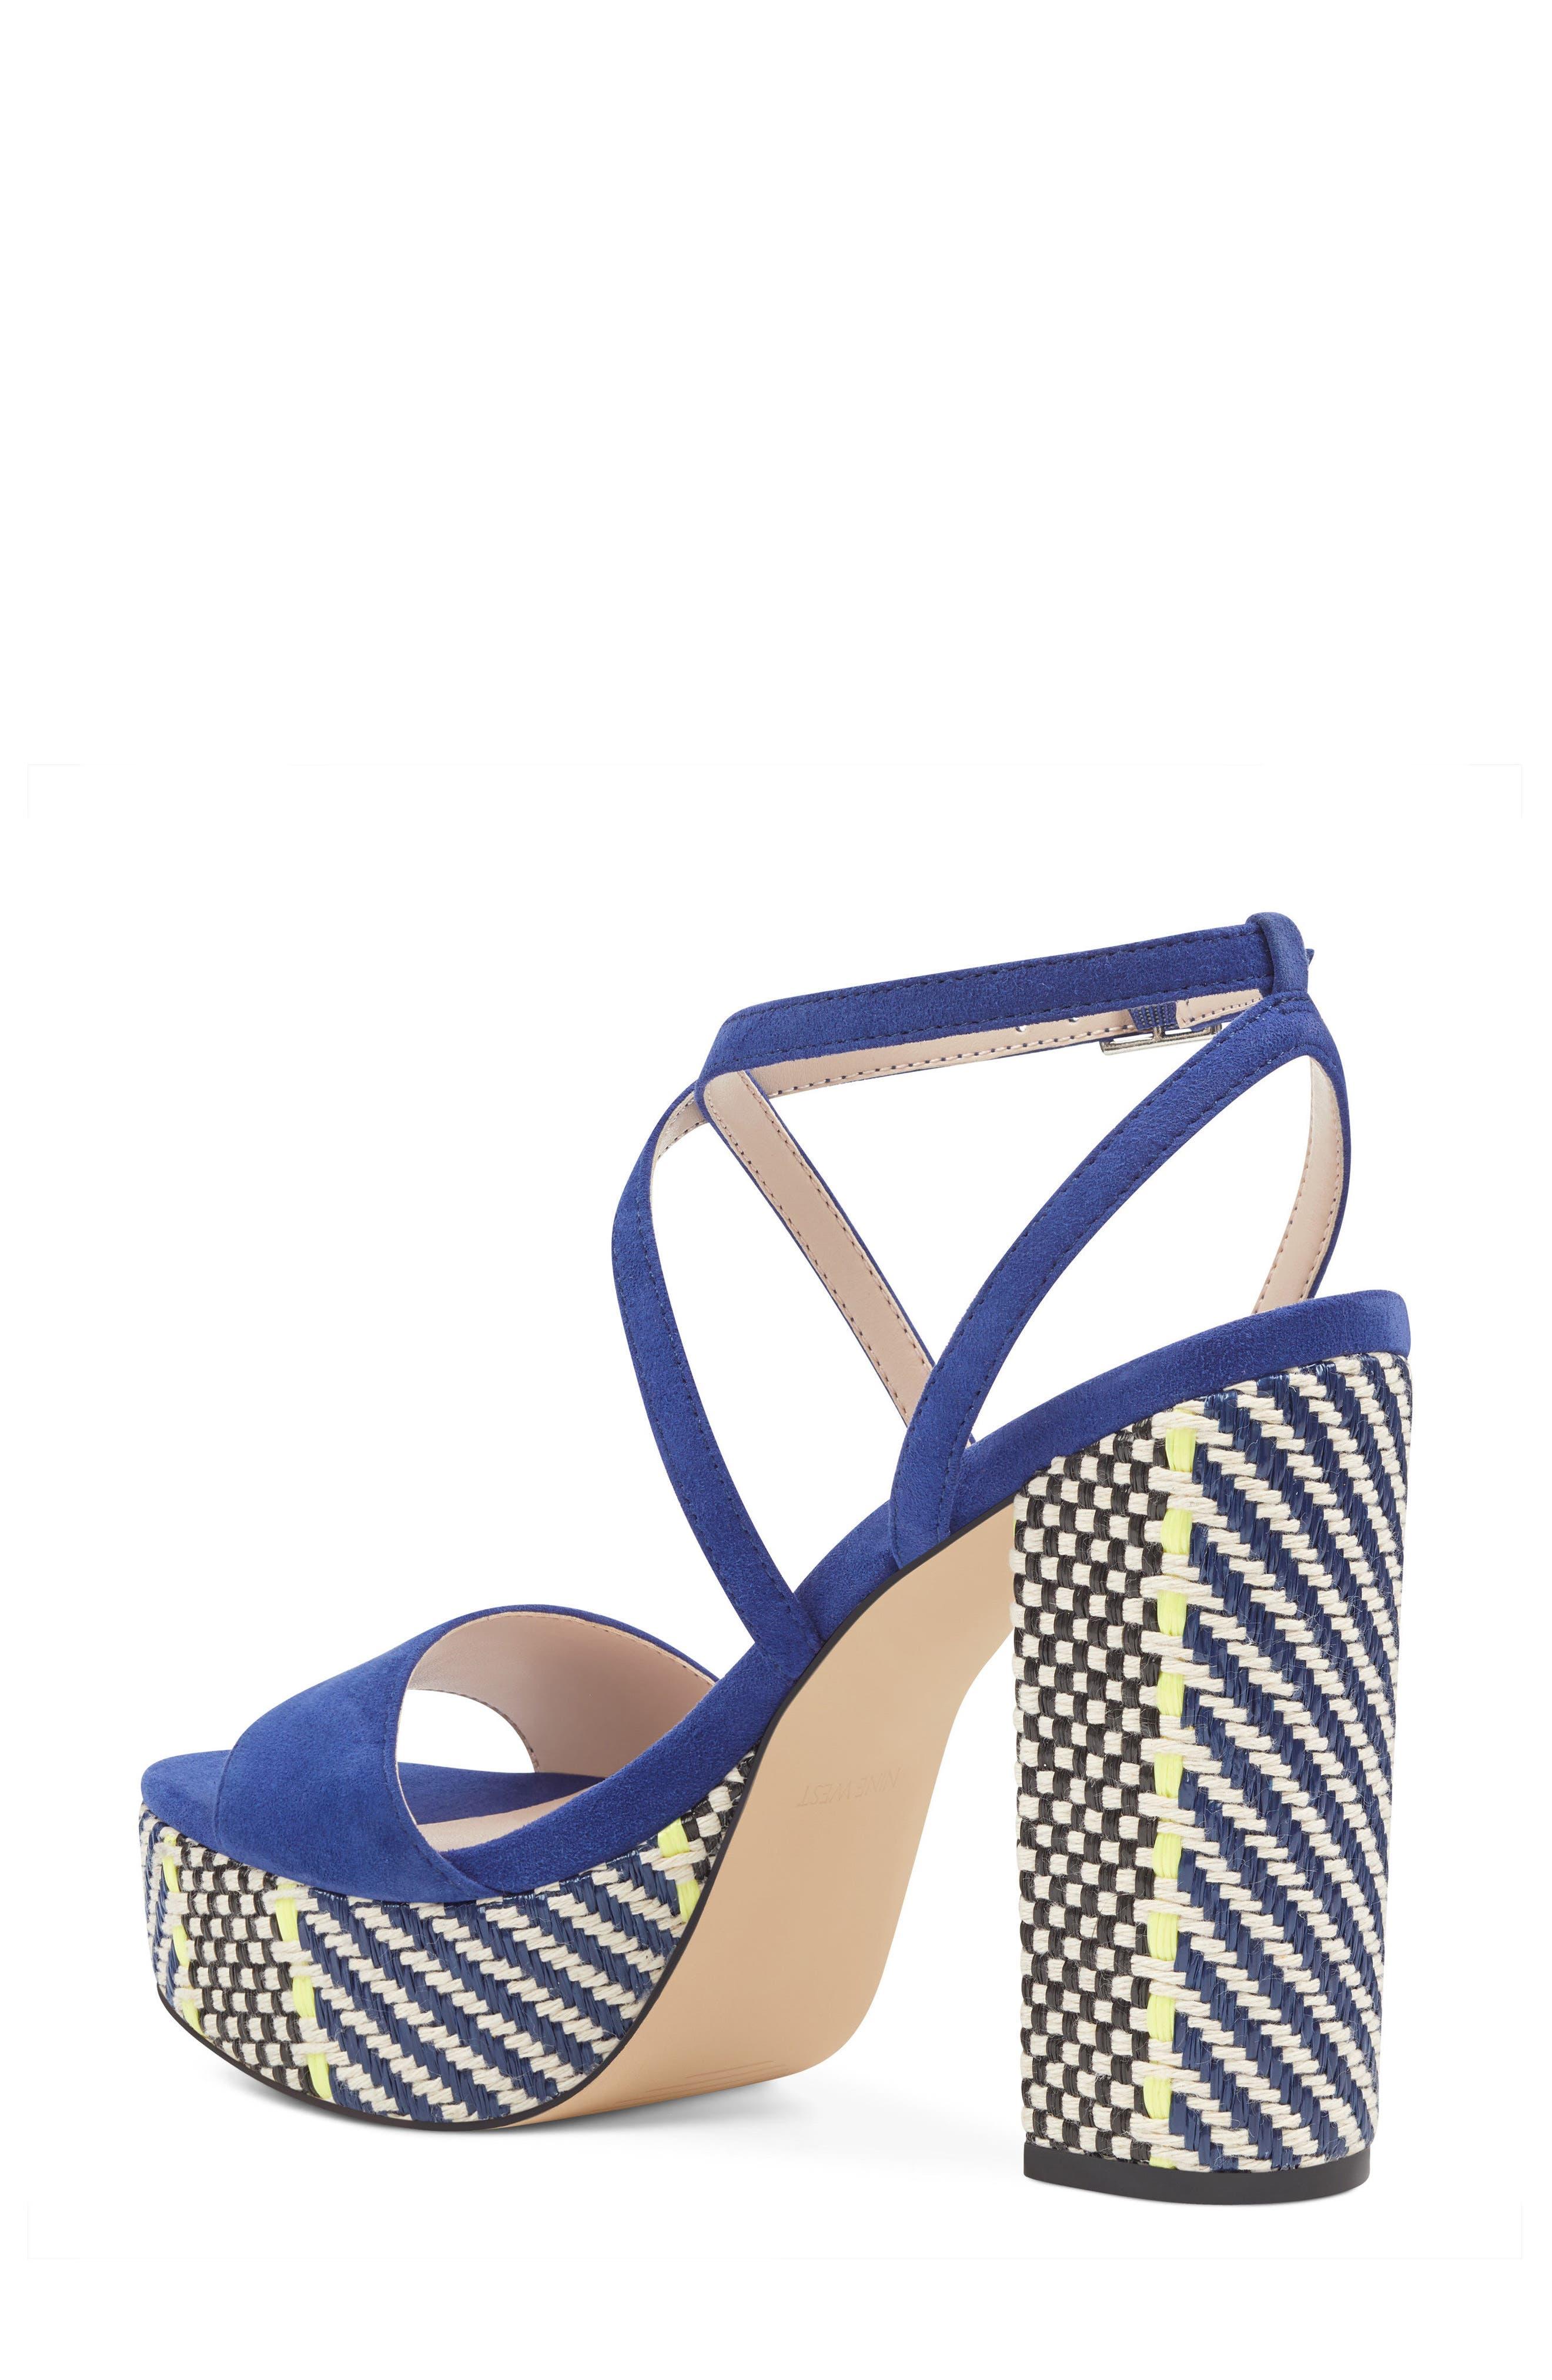 Markando Platform Sandal,                             Alternate thumbnail 2, color,                             Dark Blue Suede